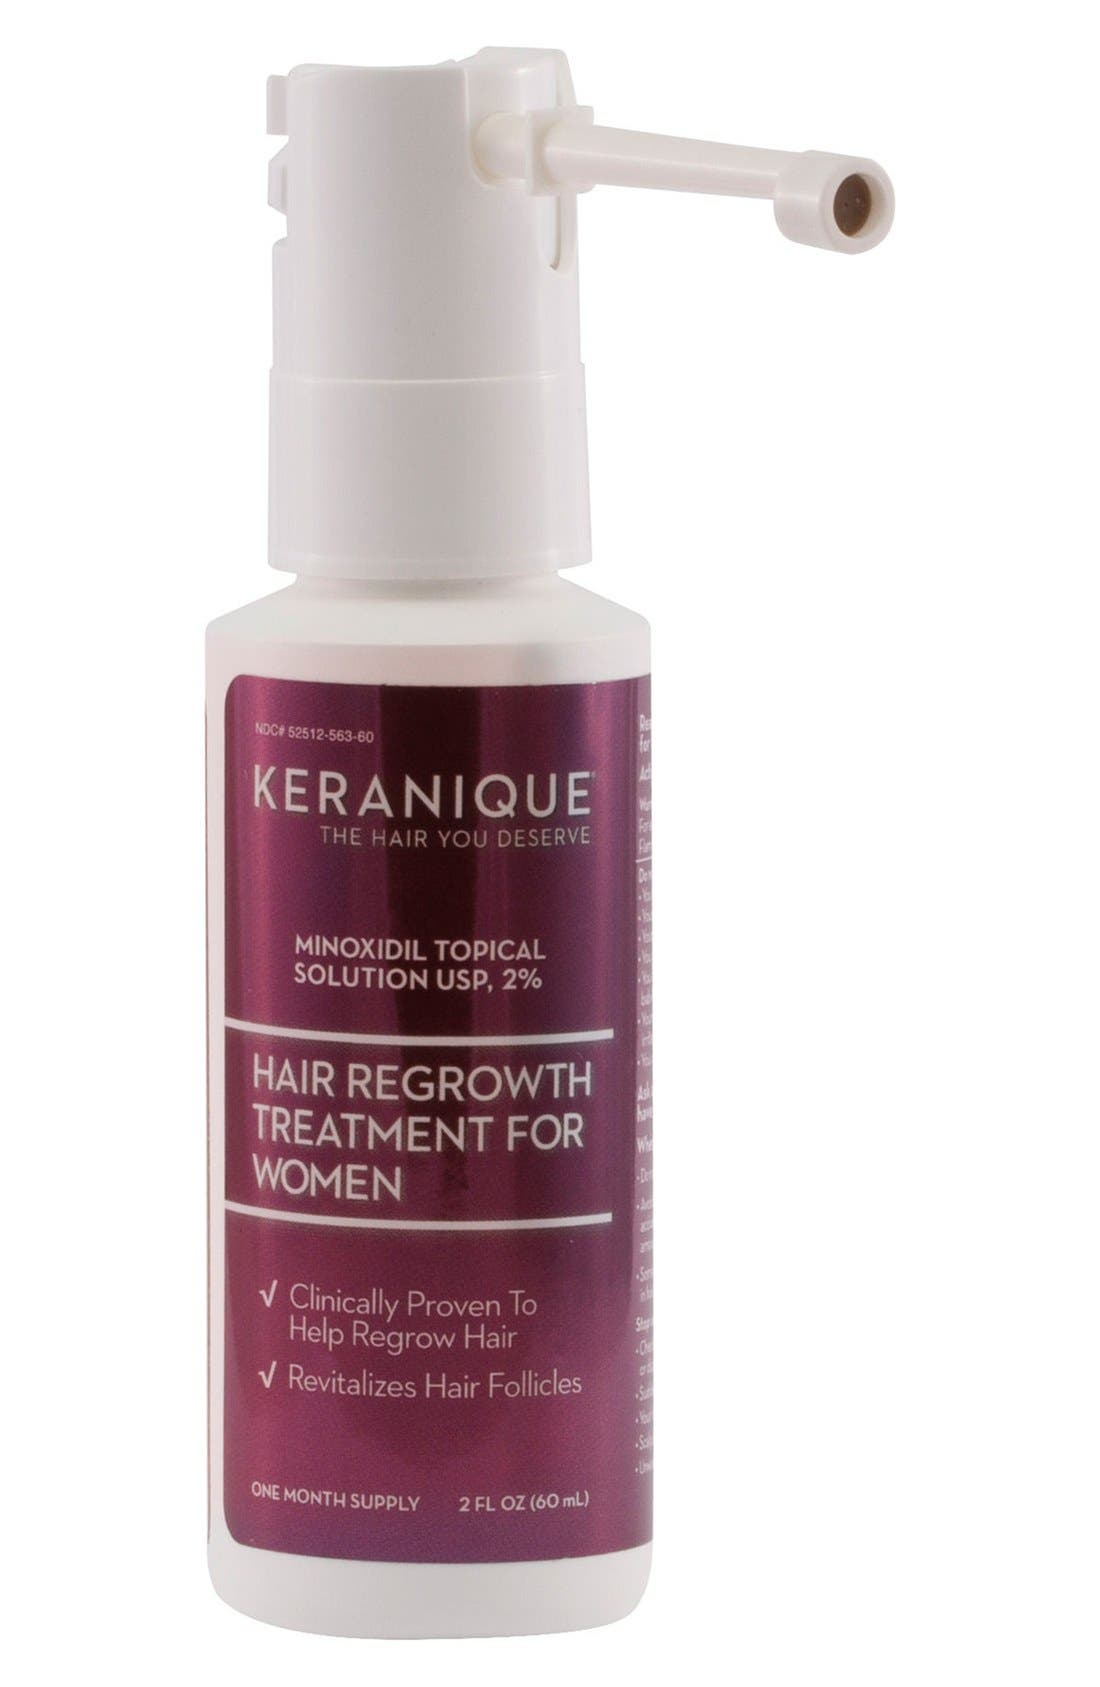 KERANIQUE Hair Regrowth Treatment With Minoxidil Easy Precision Sprayer 2 Oz